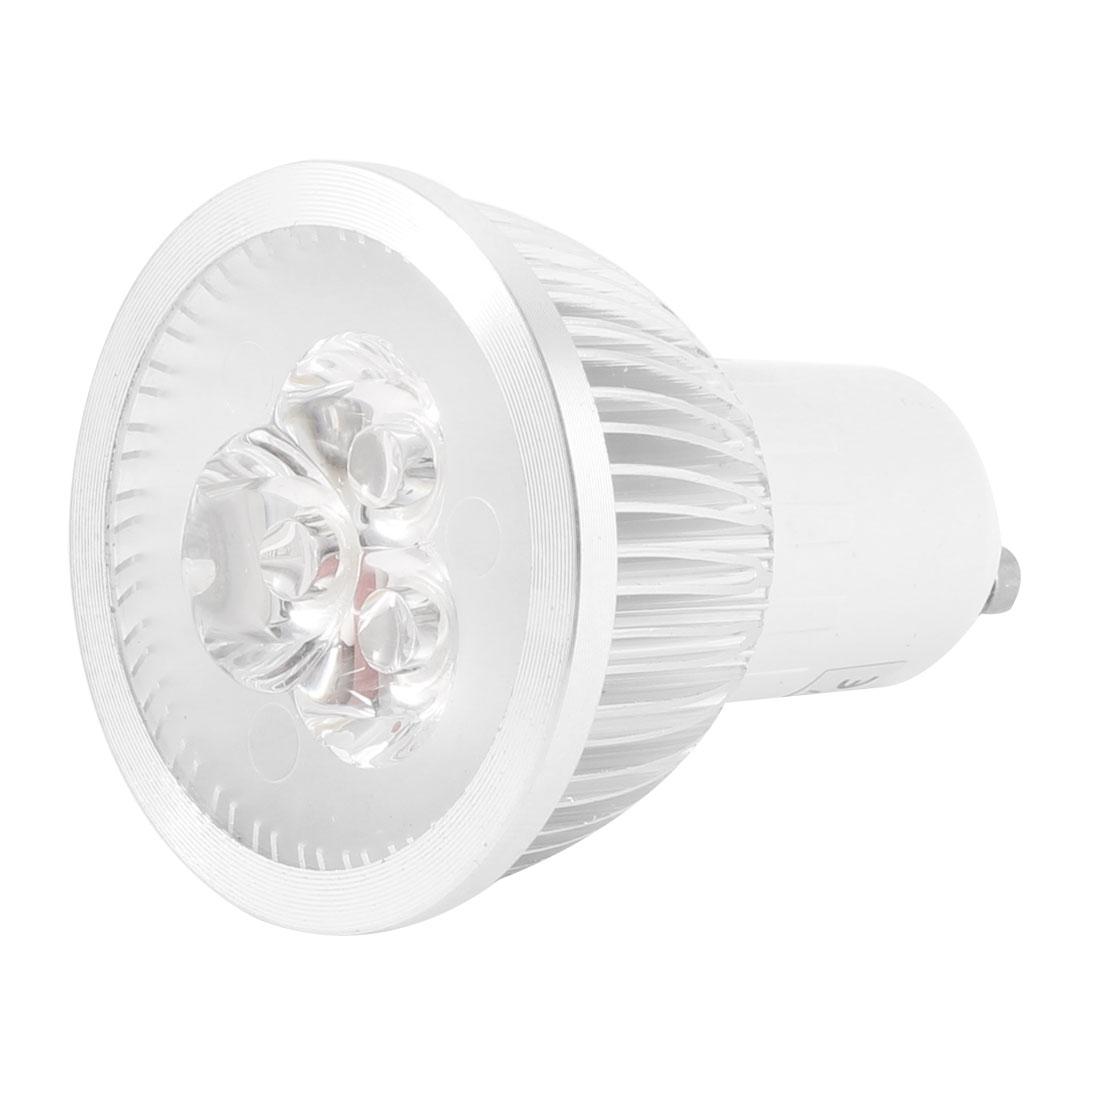 110-240V 3W 3 LEDs Warm White Light Energy Saving GU10 Spotlight Bulb